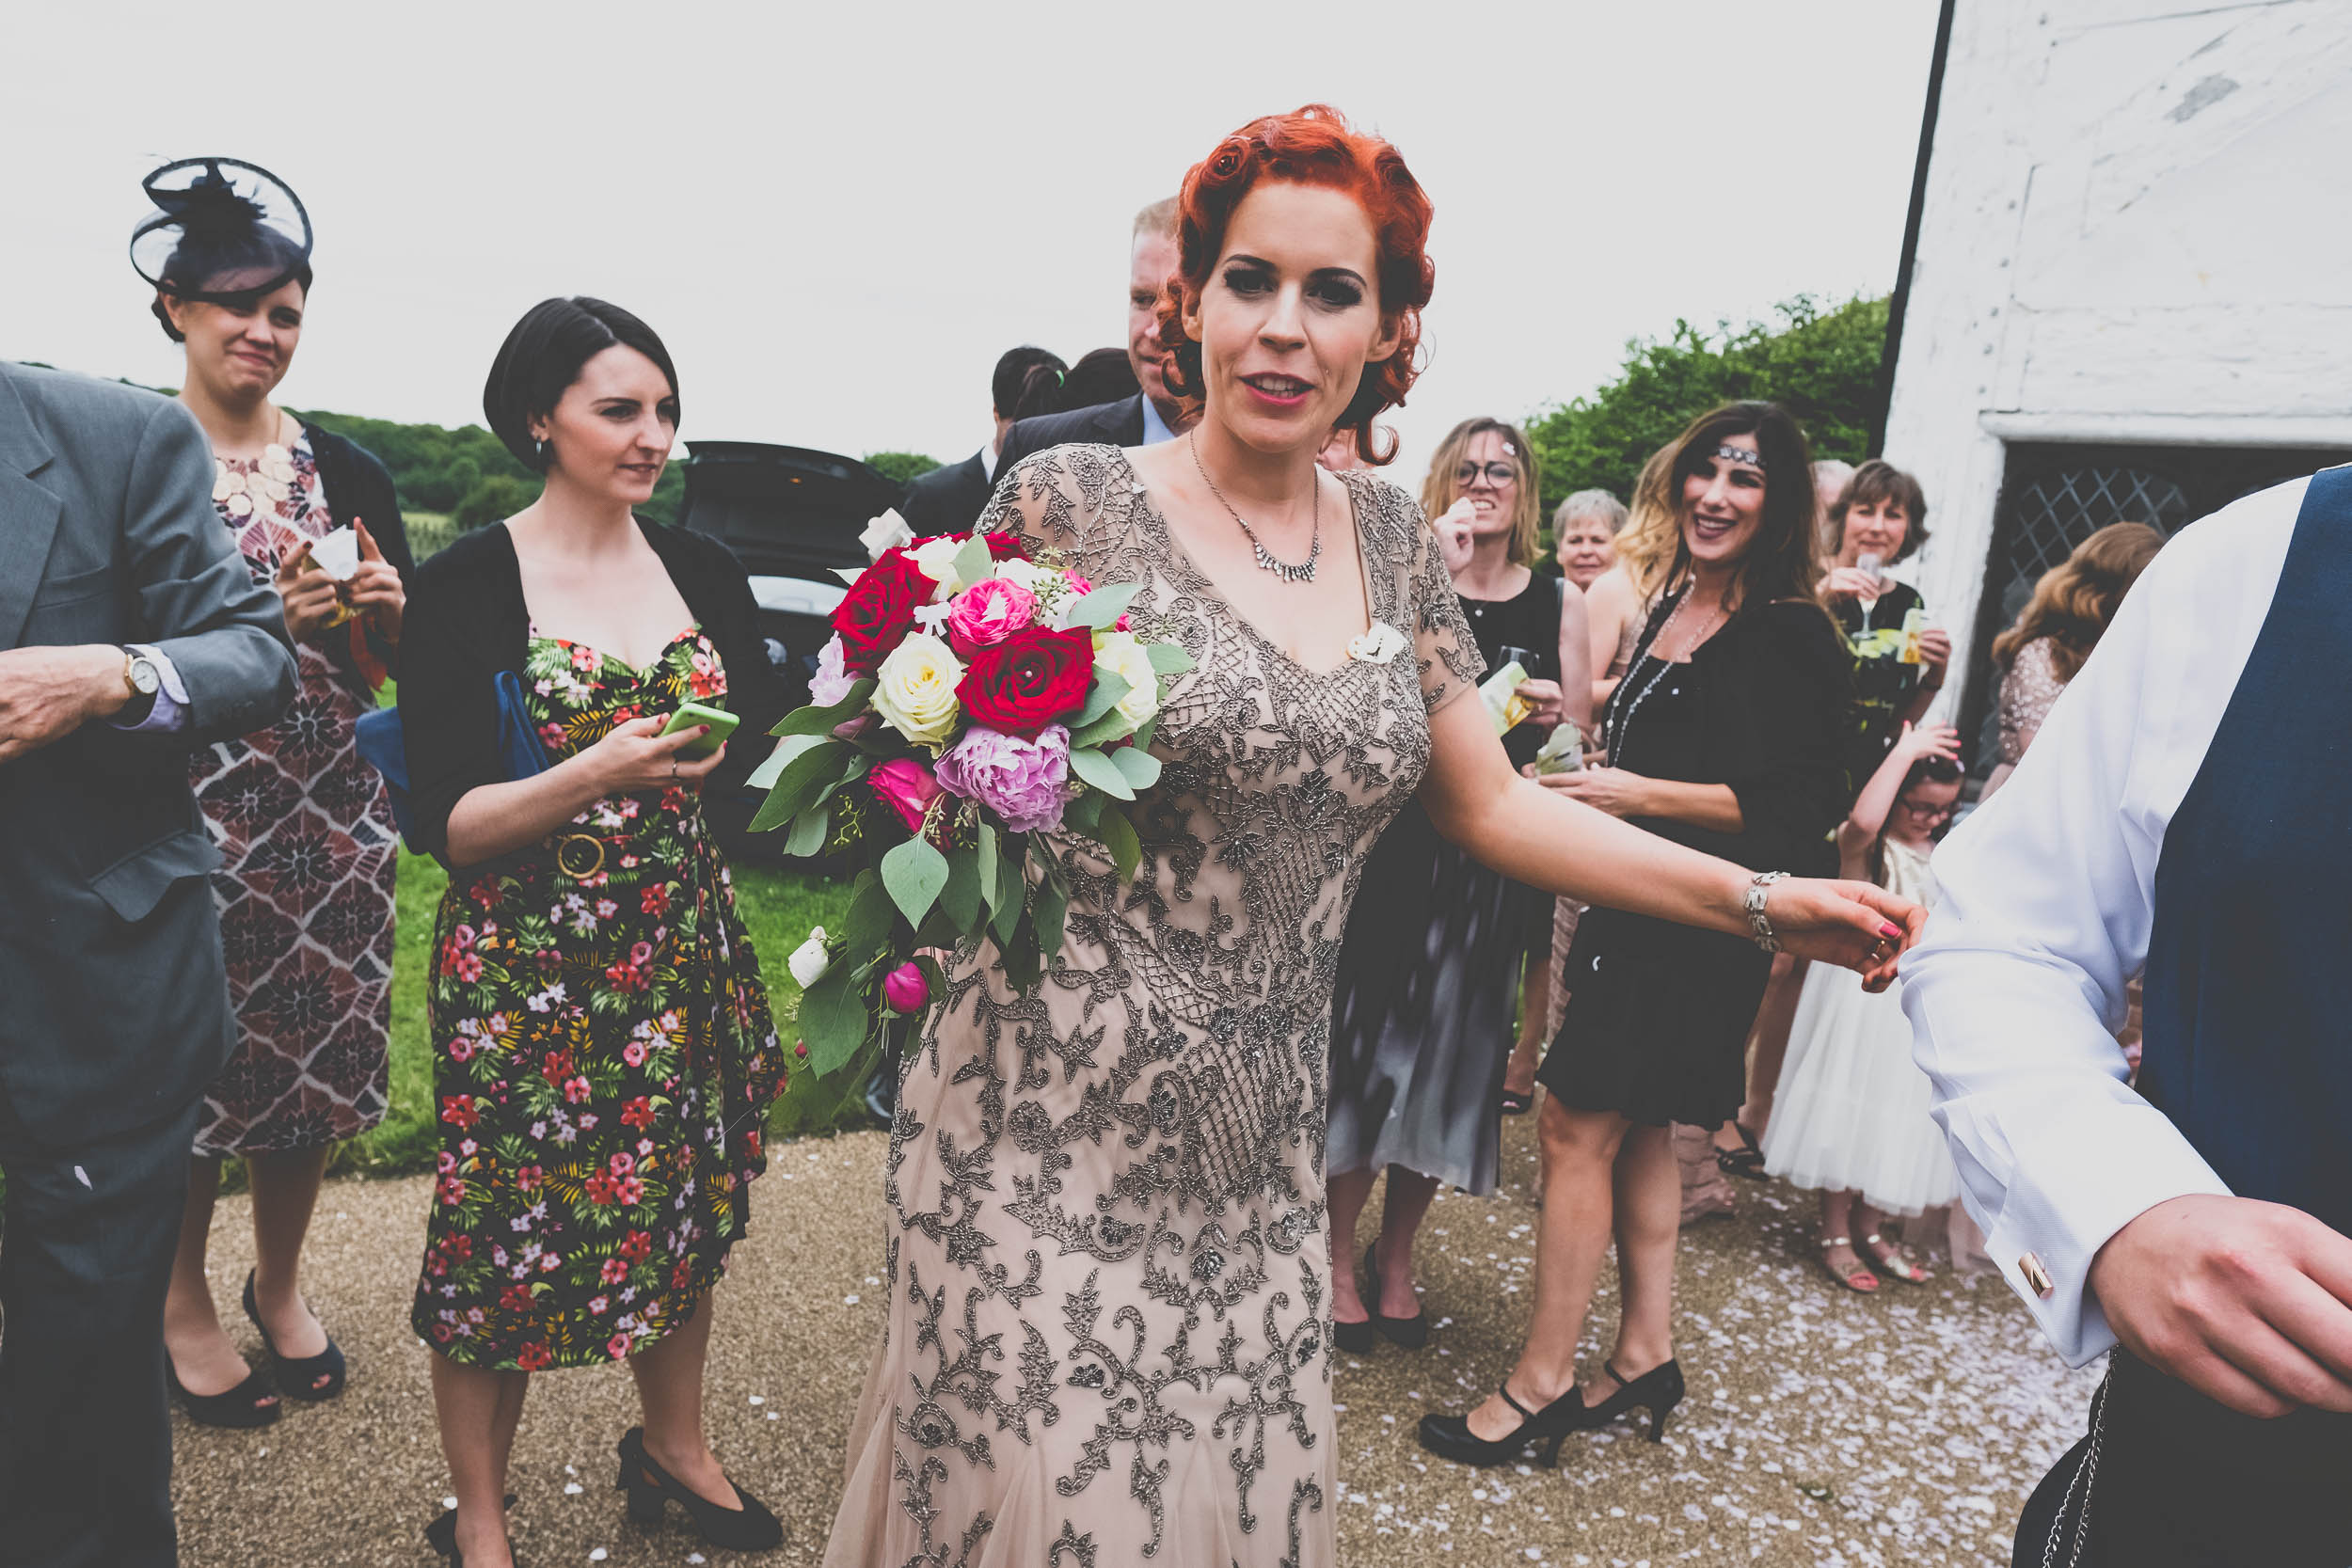 queen-elizabeths-hunting-lodge-epping-forest-wedding228.jpg